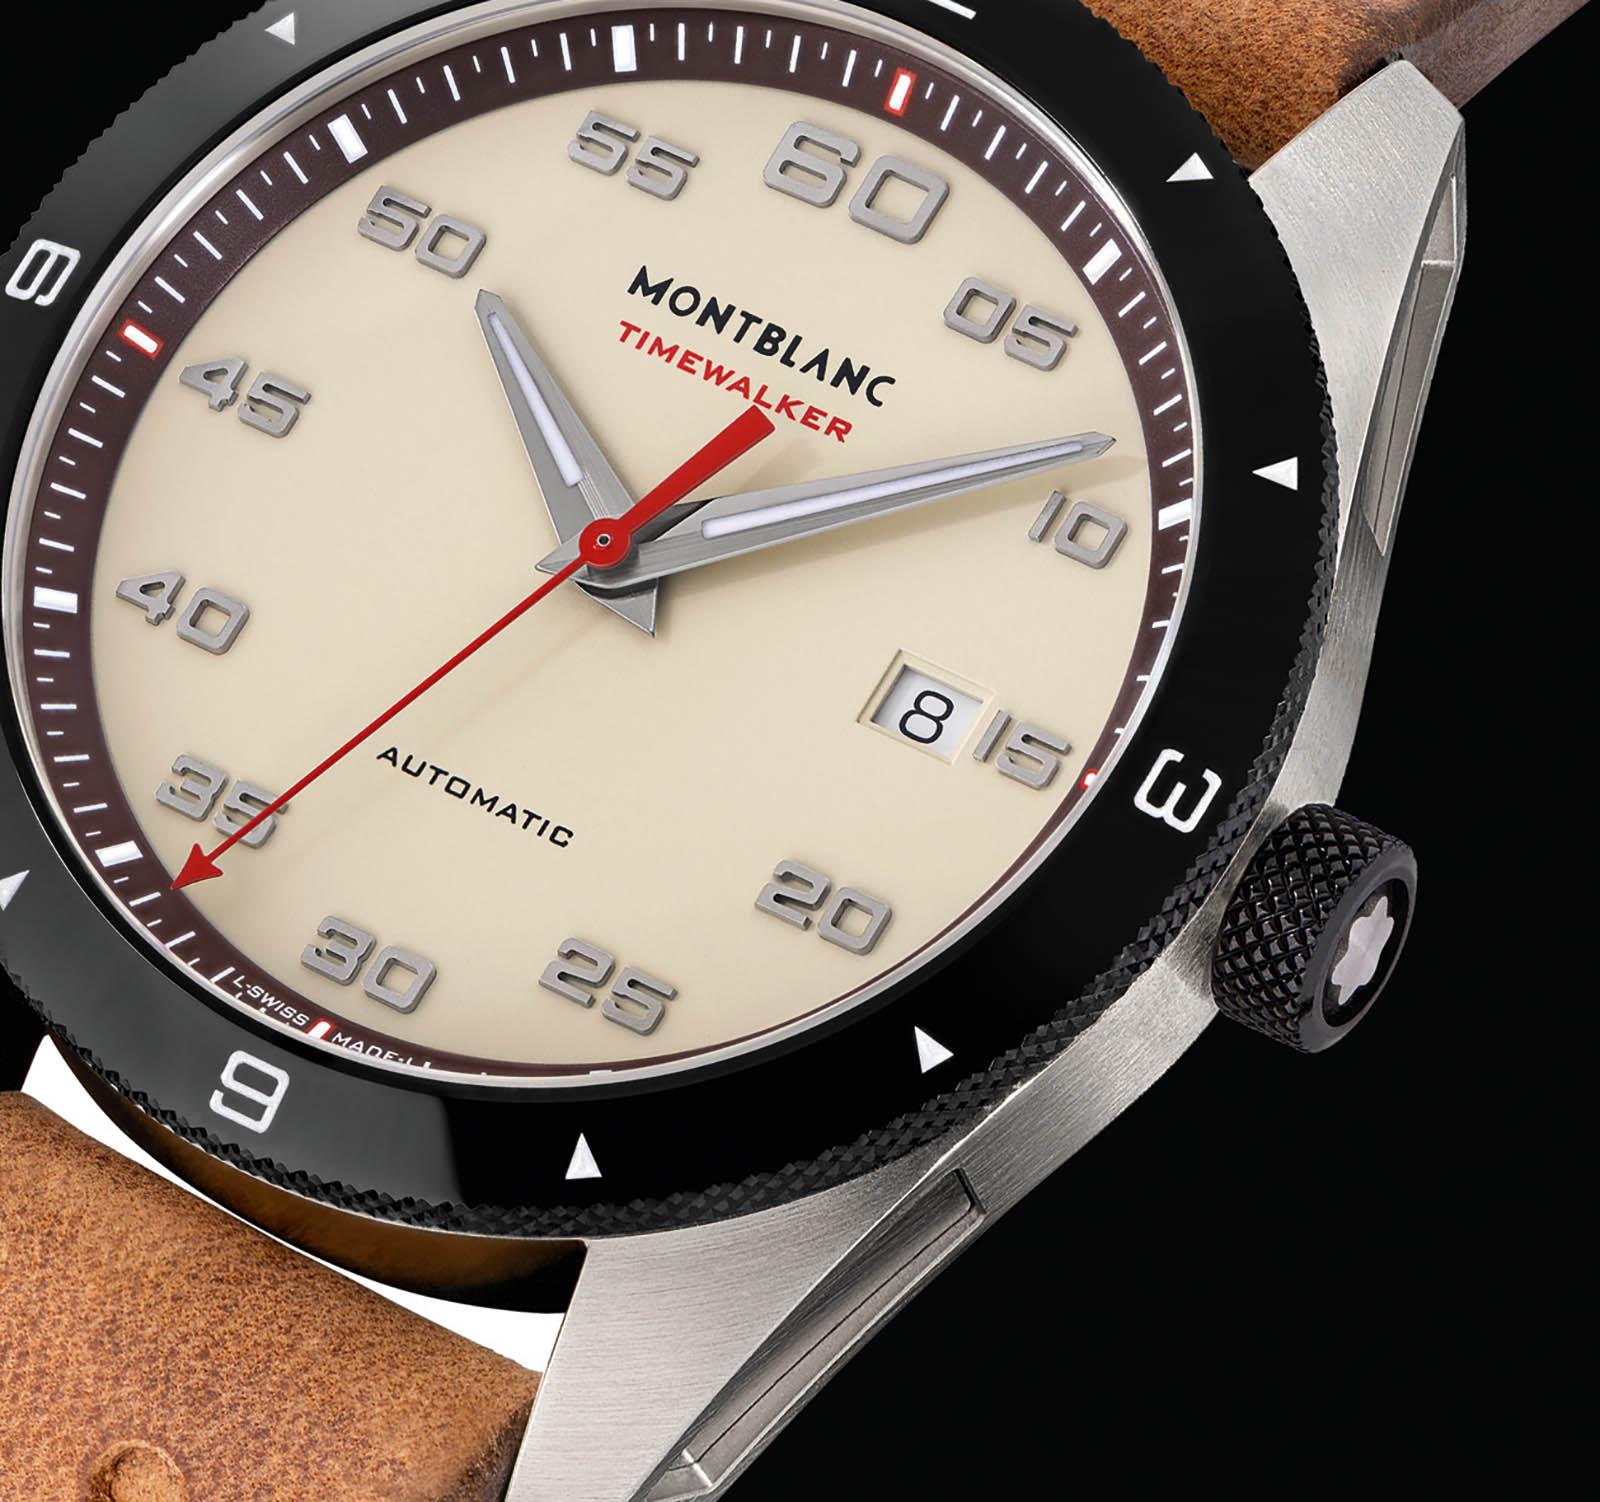 Montblanc TimeWalker Date Automatic_118494_2